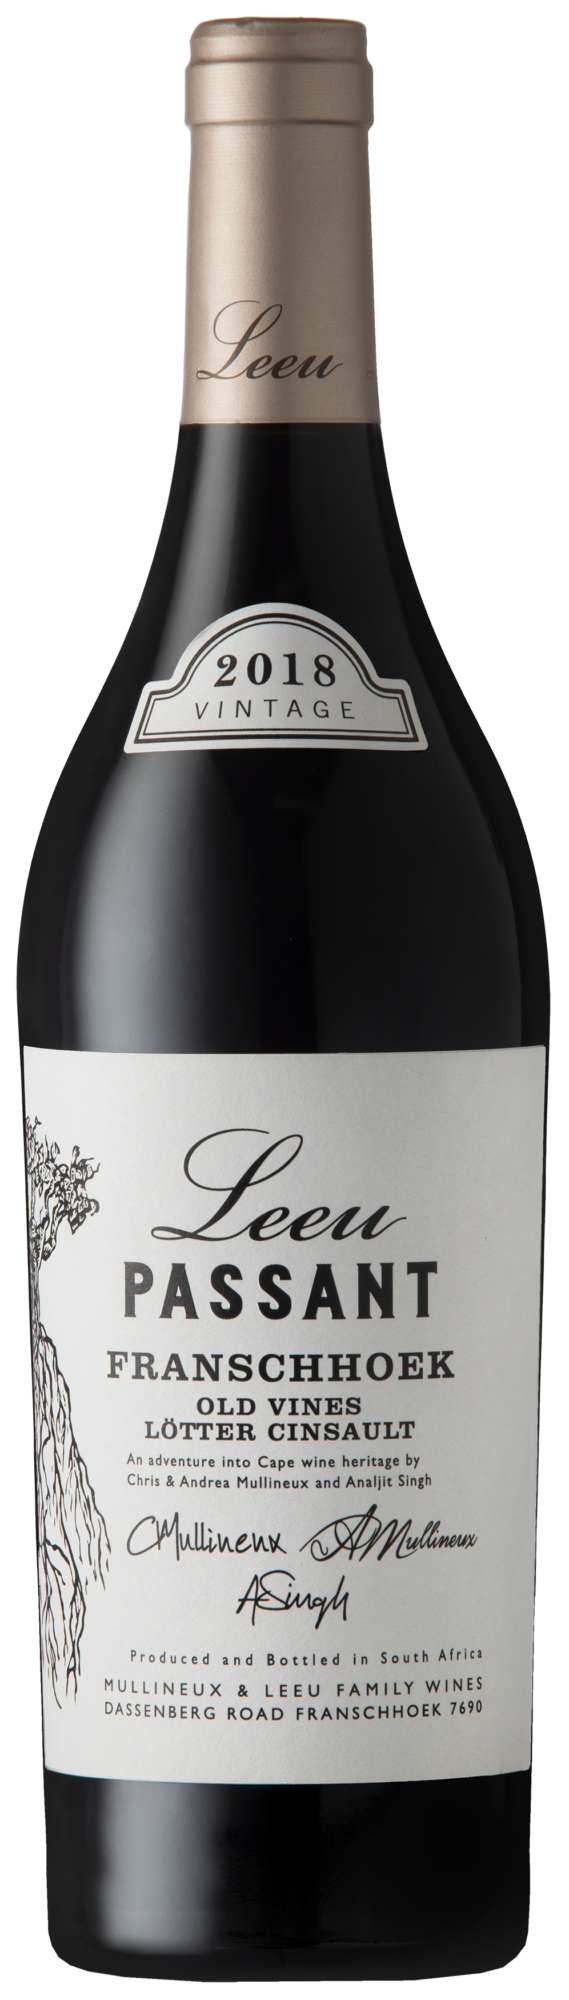 Leeu Passant Wine Bottle